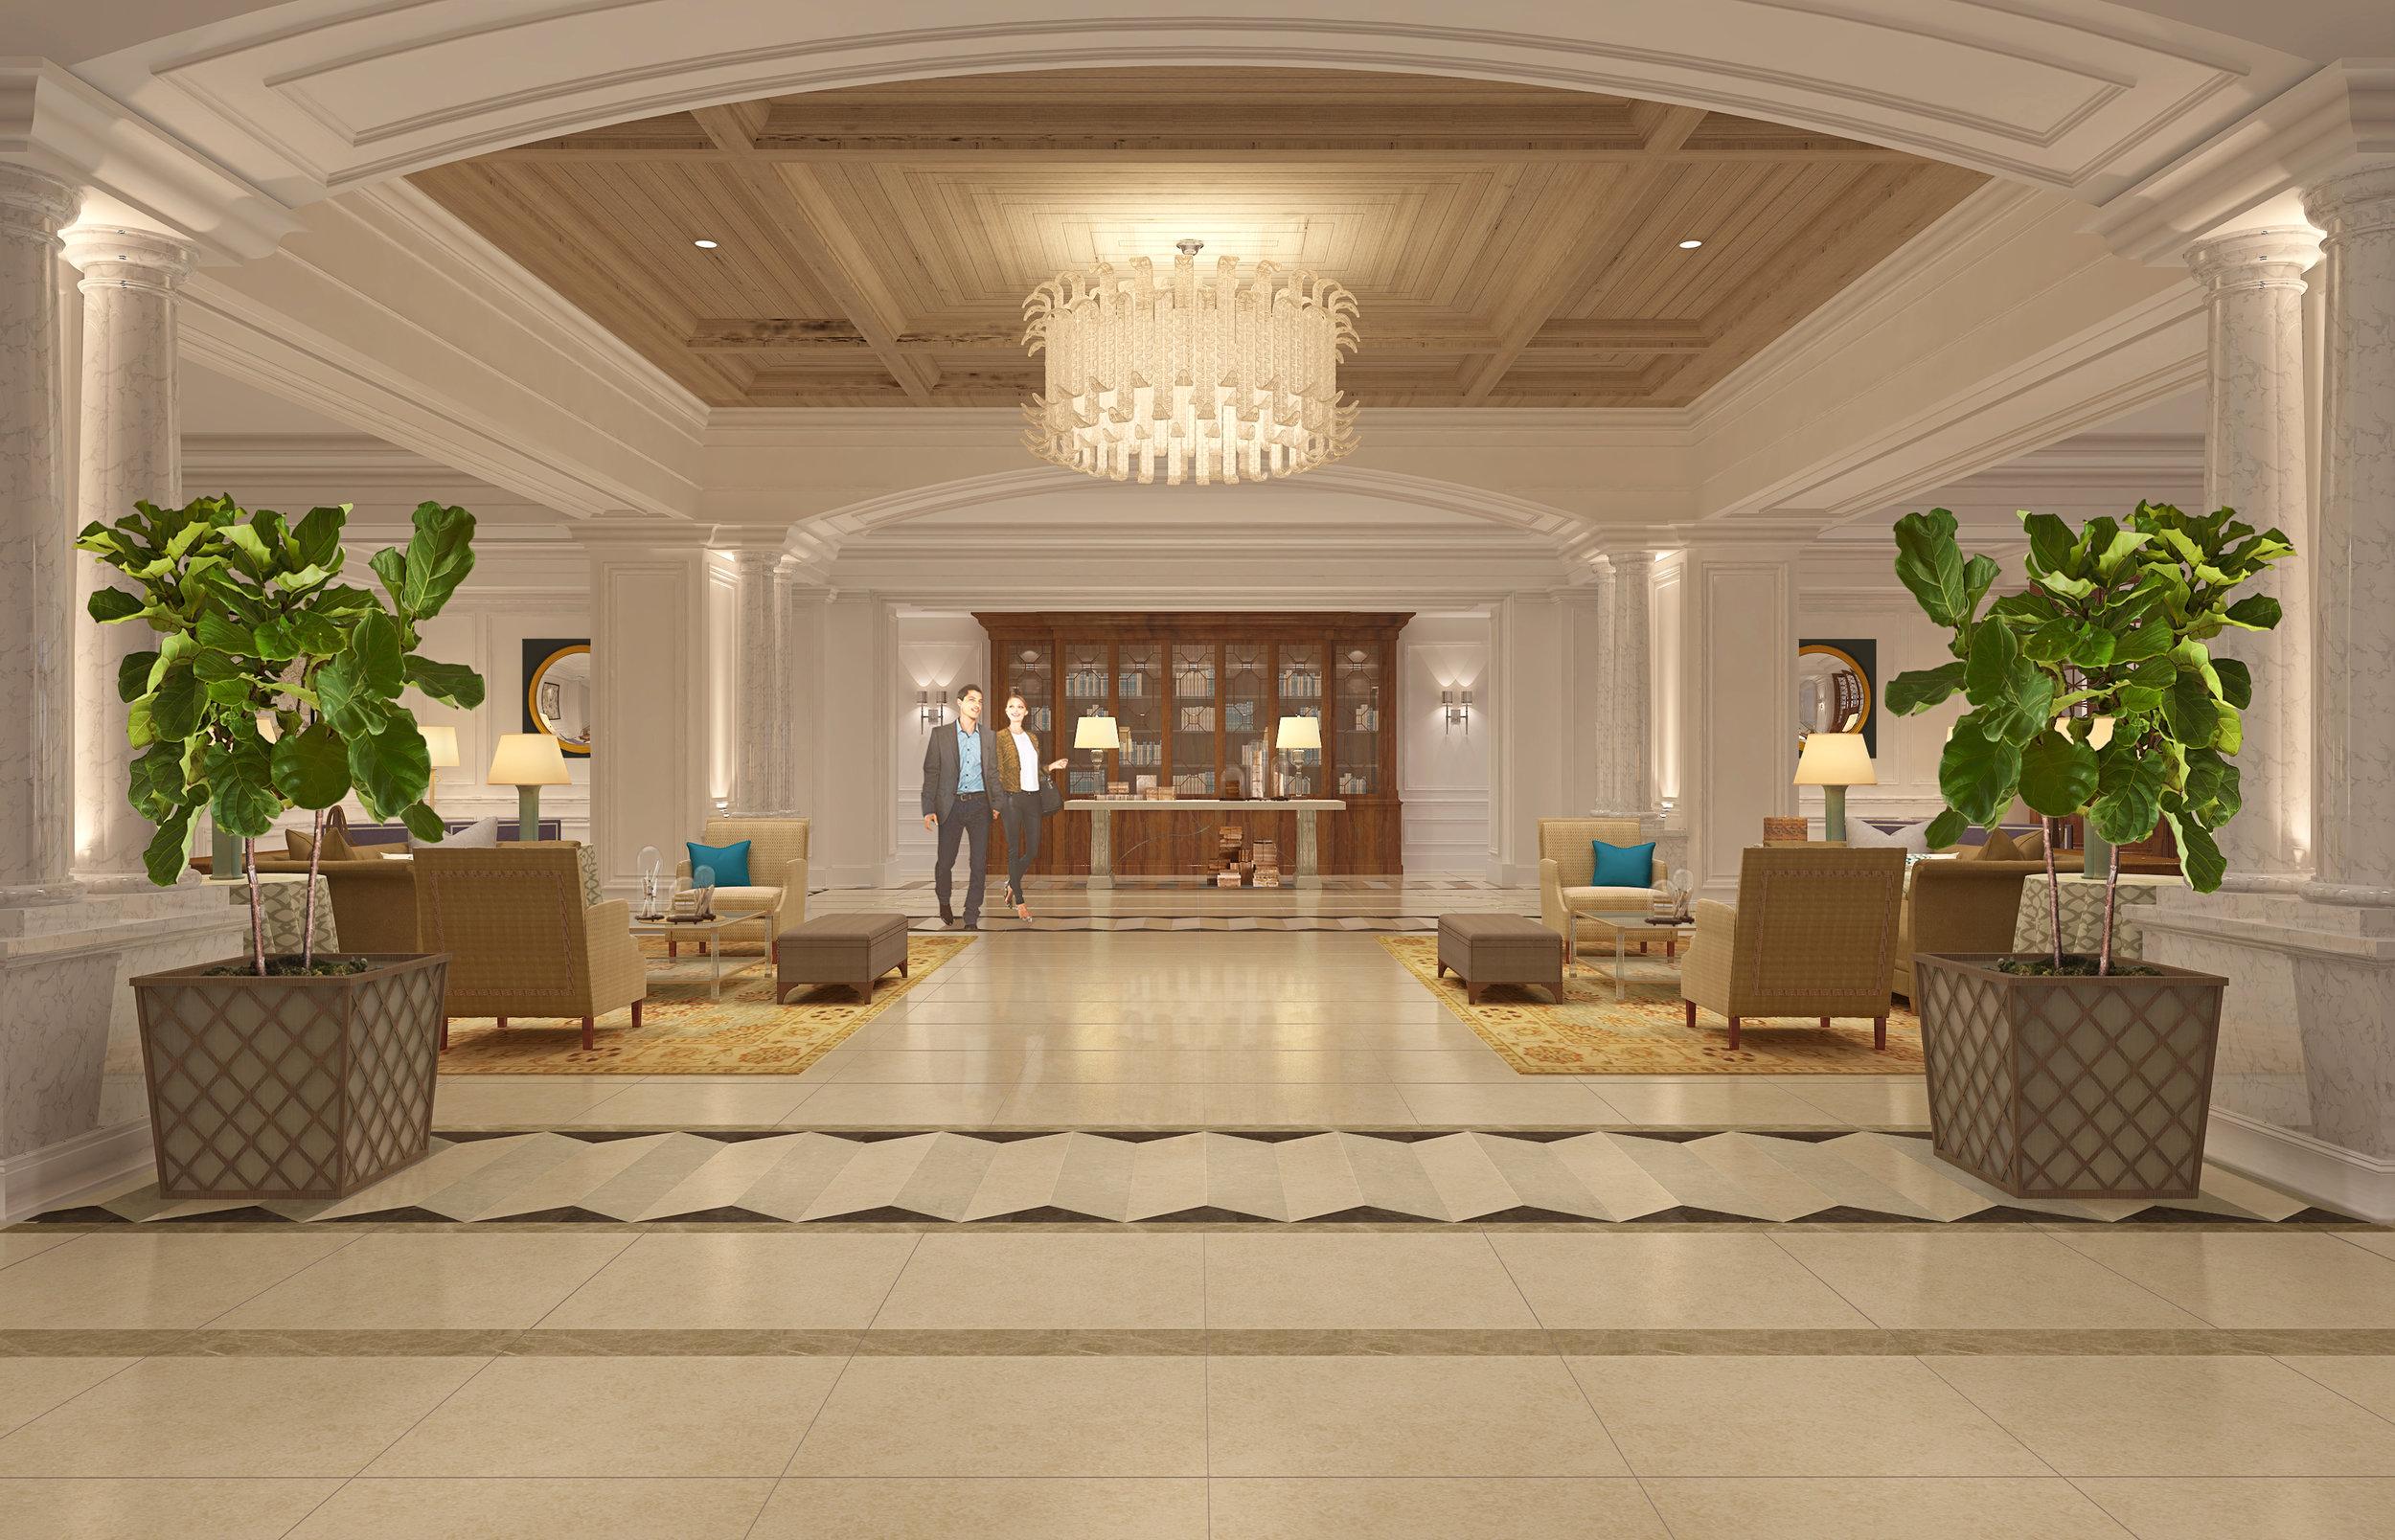 FINAL! Marion Square Lobby  Rendering.jpg